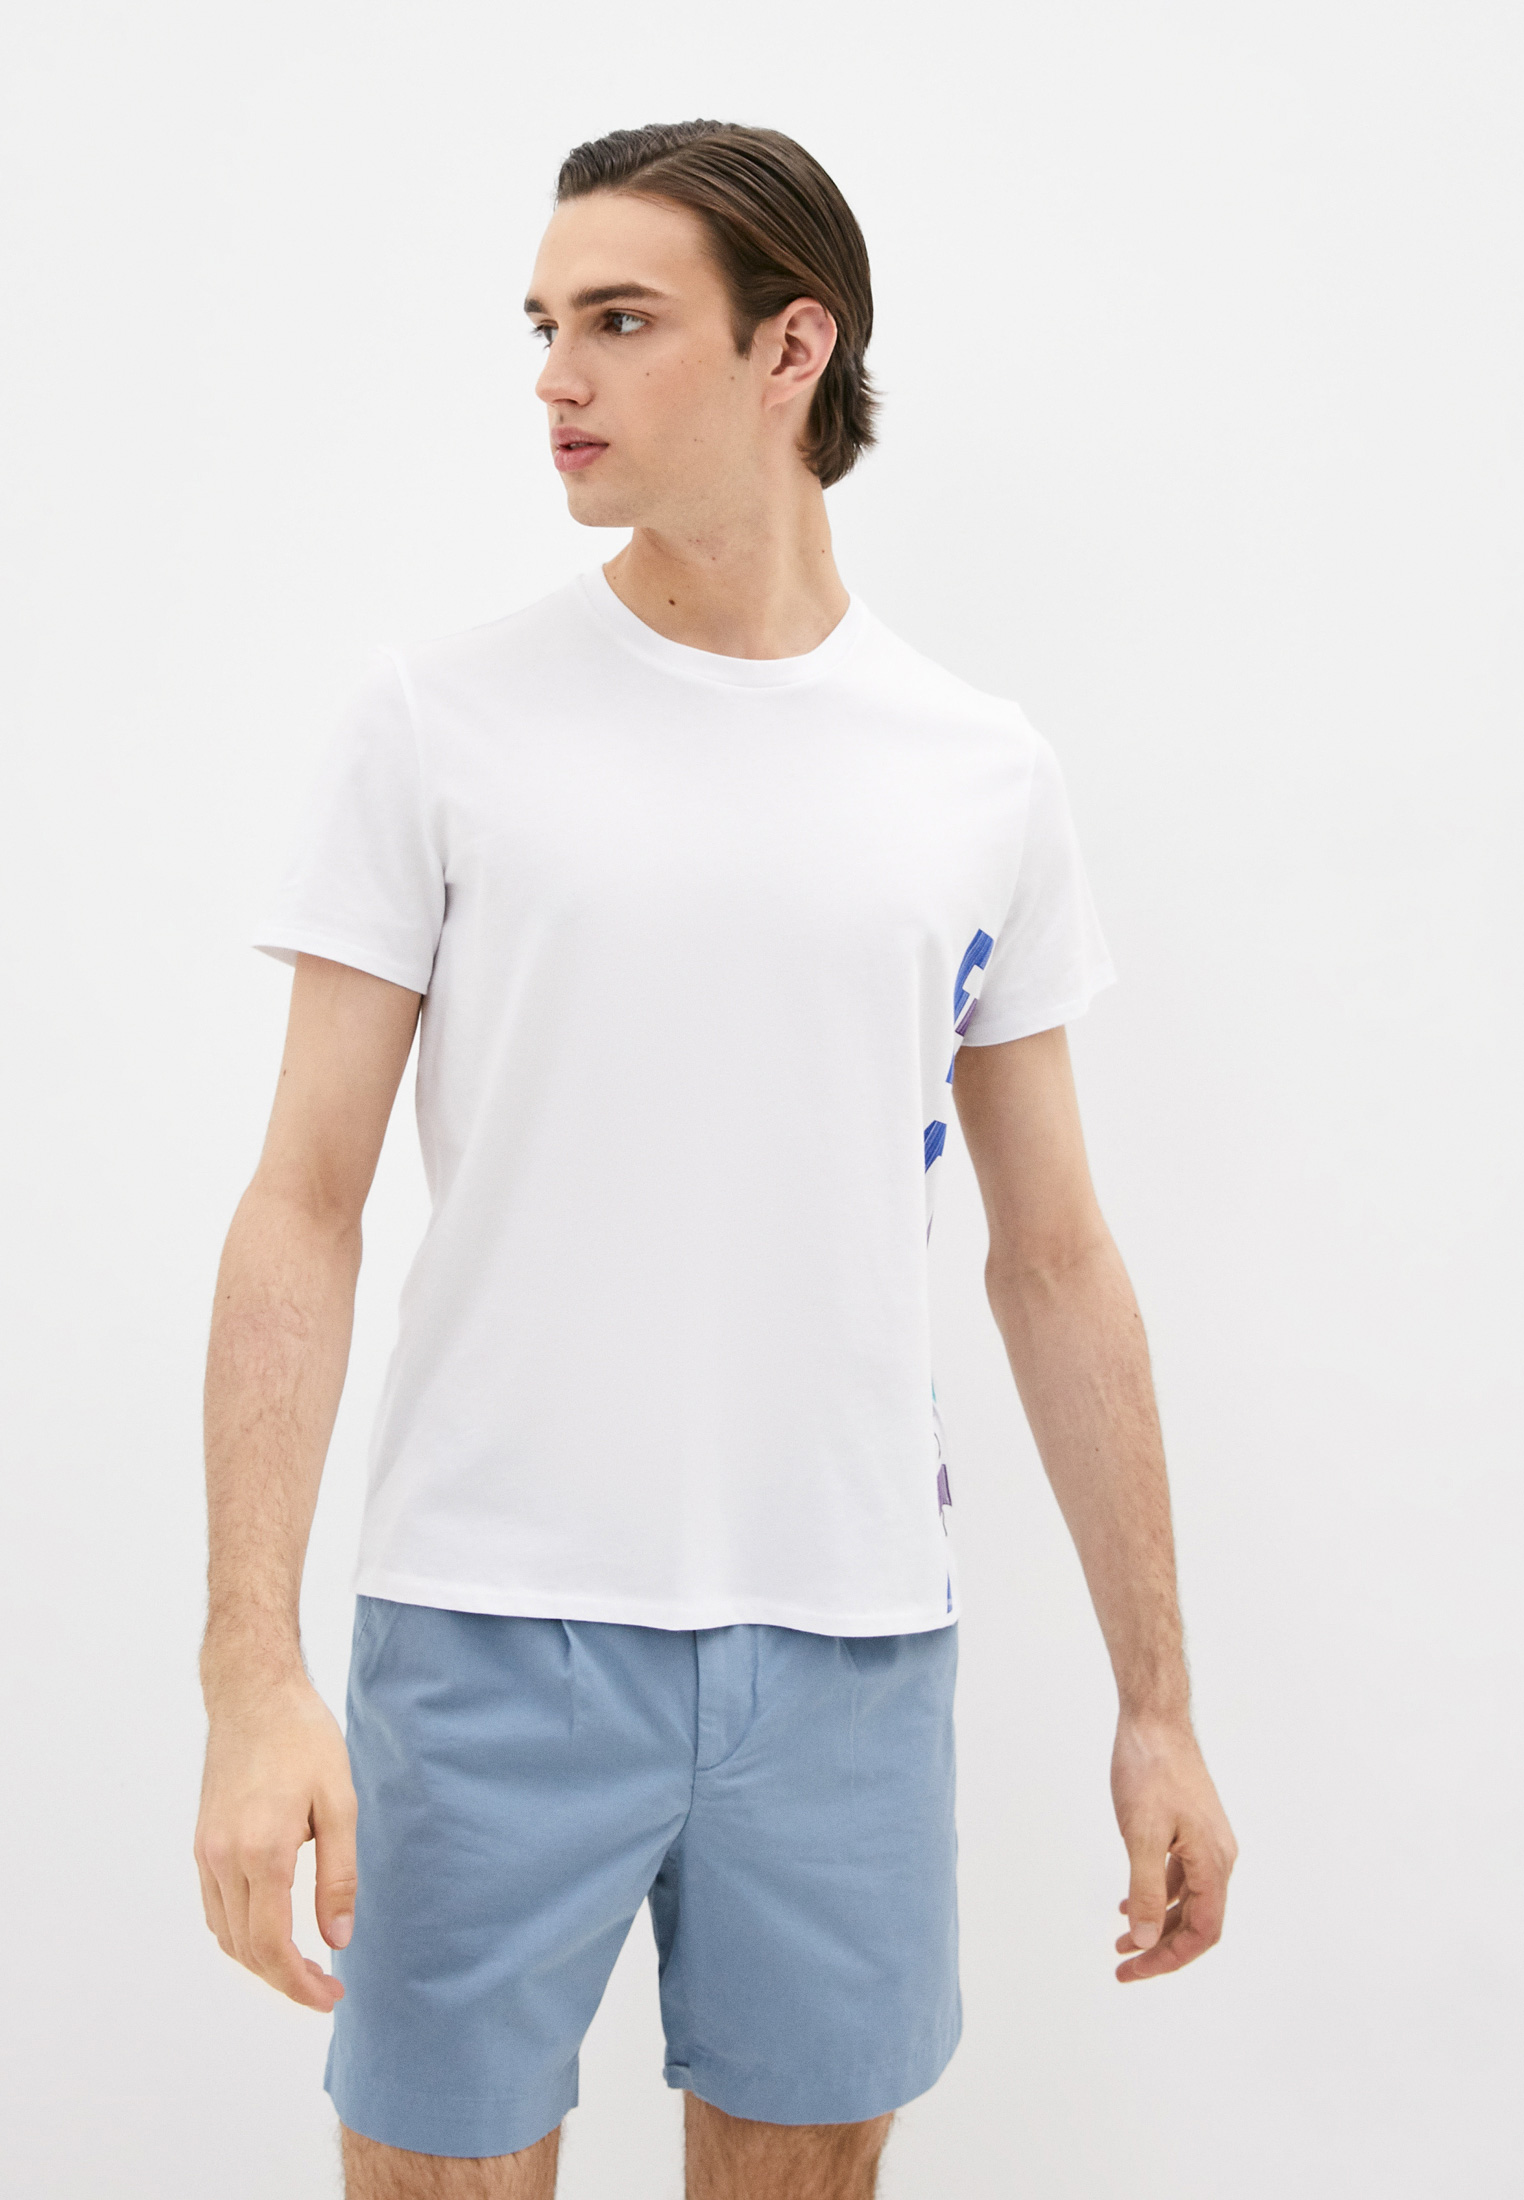 Мужская футболка Just Cavalli (Джаст Кавалли) S03GC0530N20663